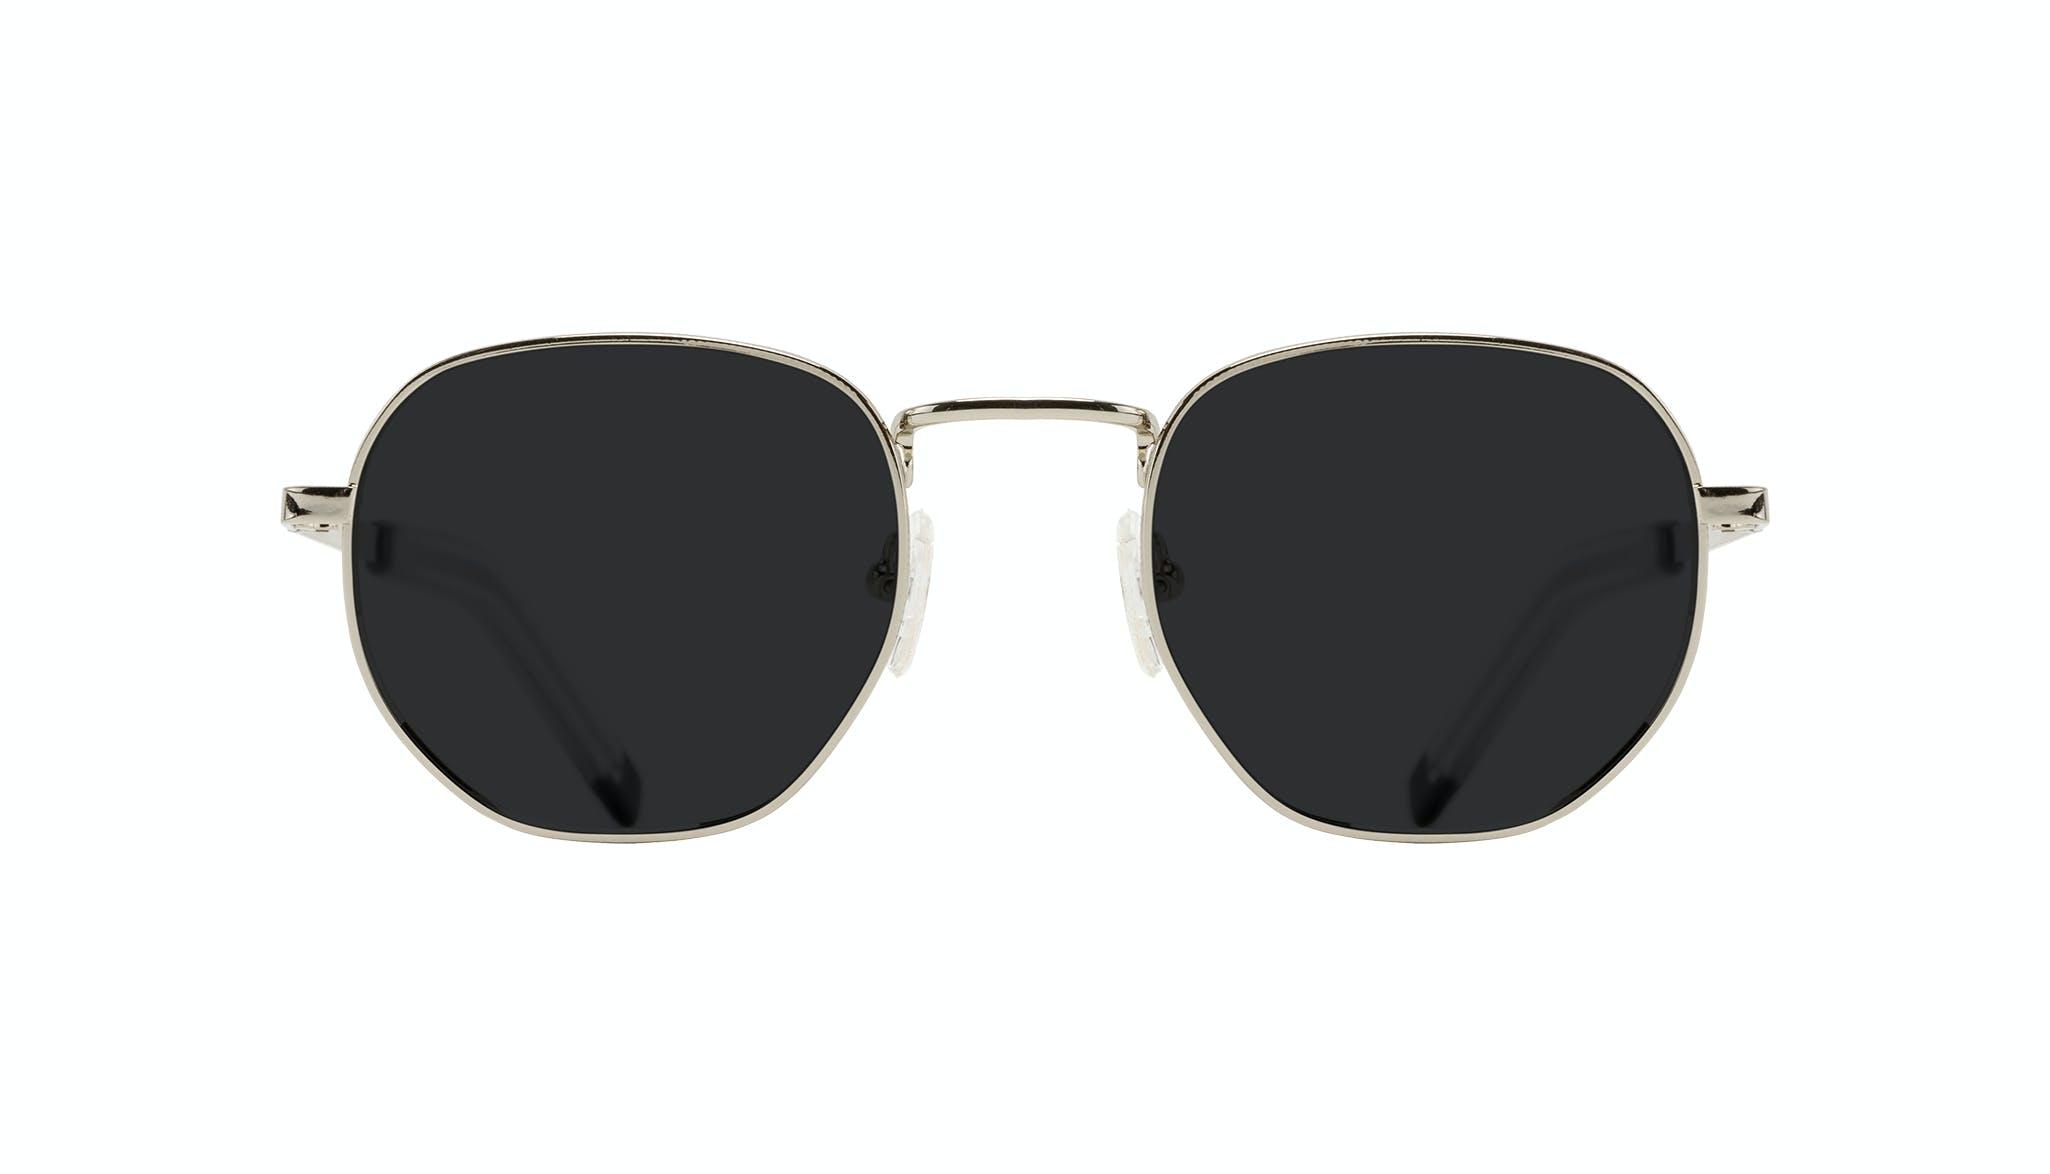 Affordable Fashion Glasses Round Sunglasses Men Rise Silver